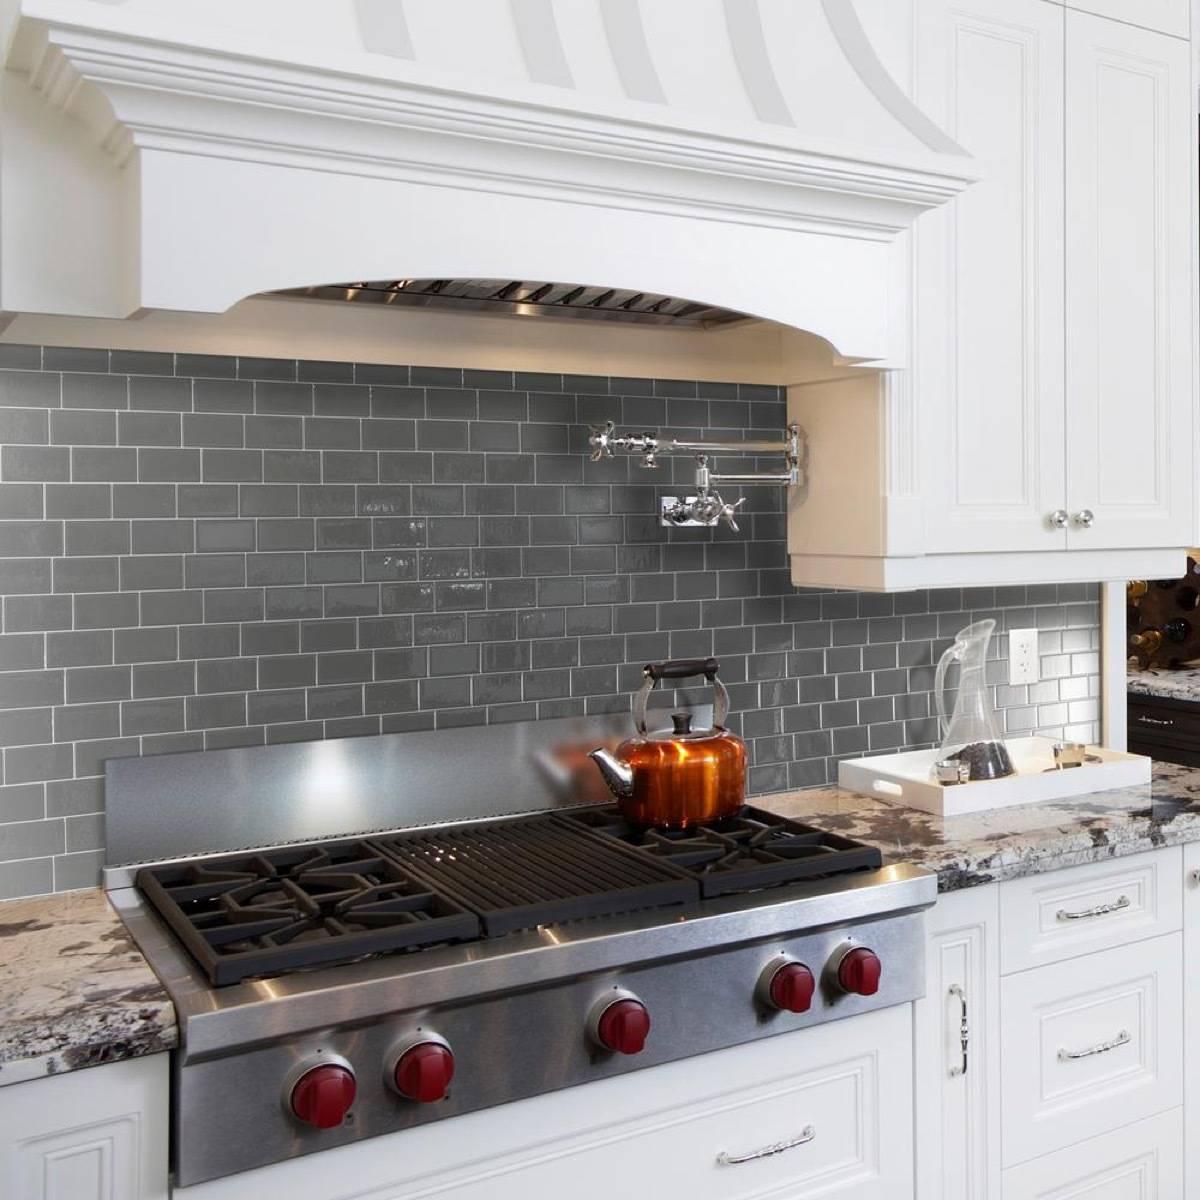 Peel-and-stick smart tiles